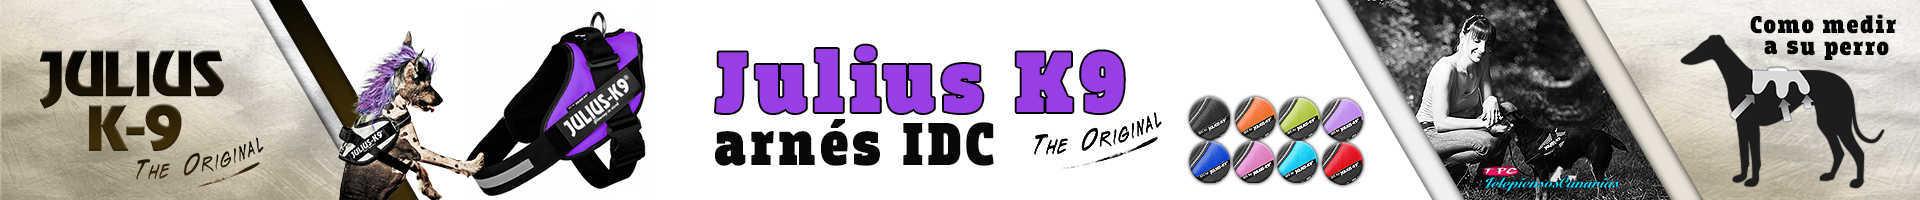 Julius-K9 arnés idc color violeta, perfección ergonómica